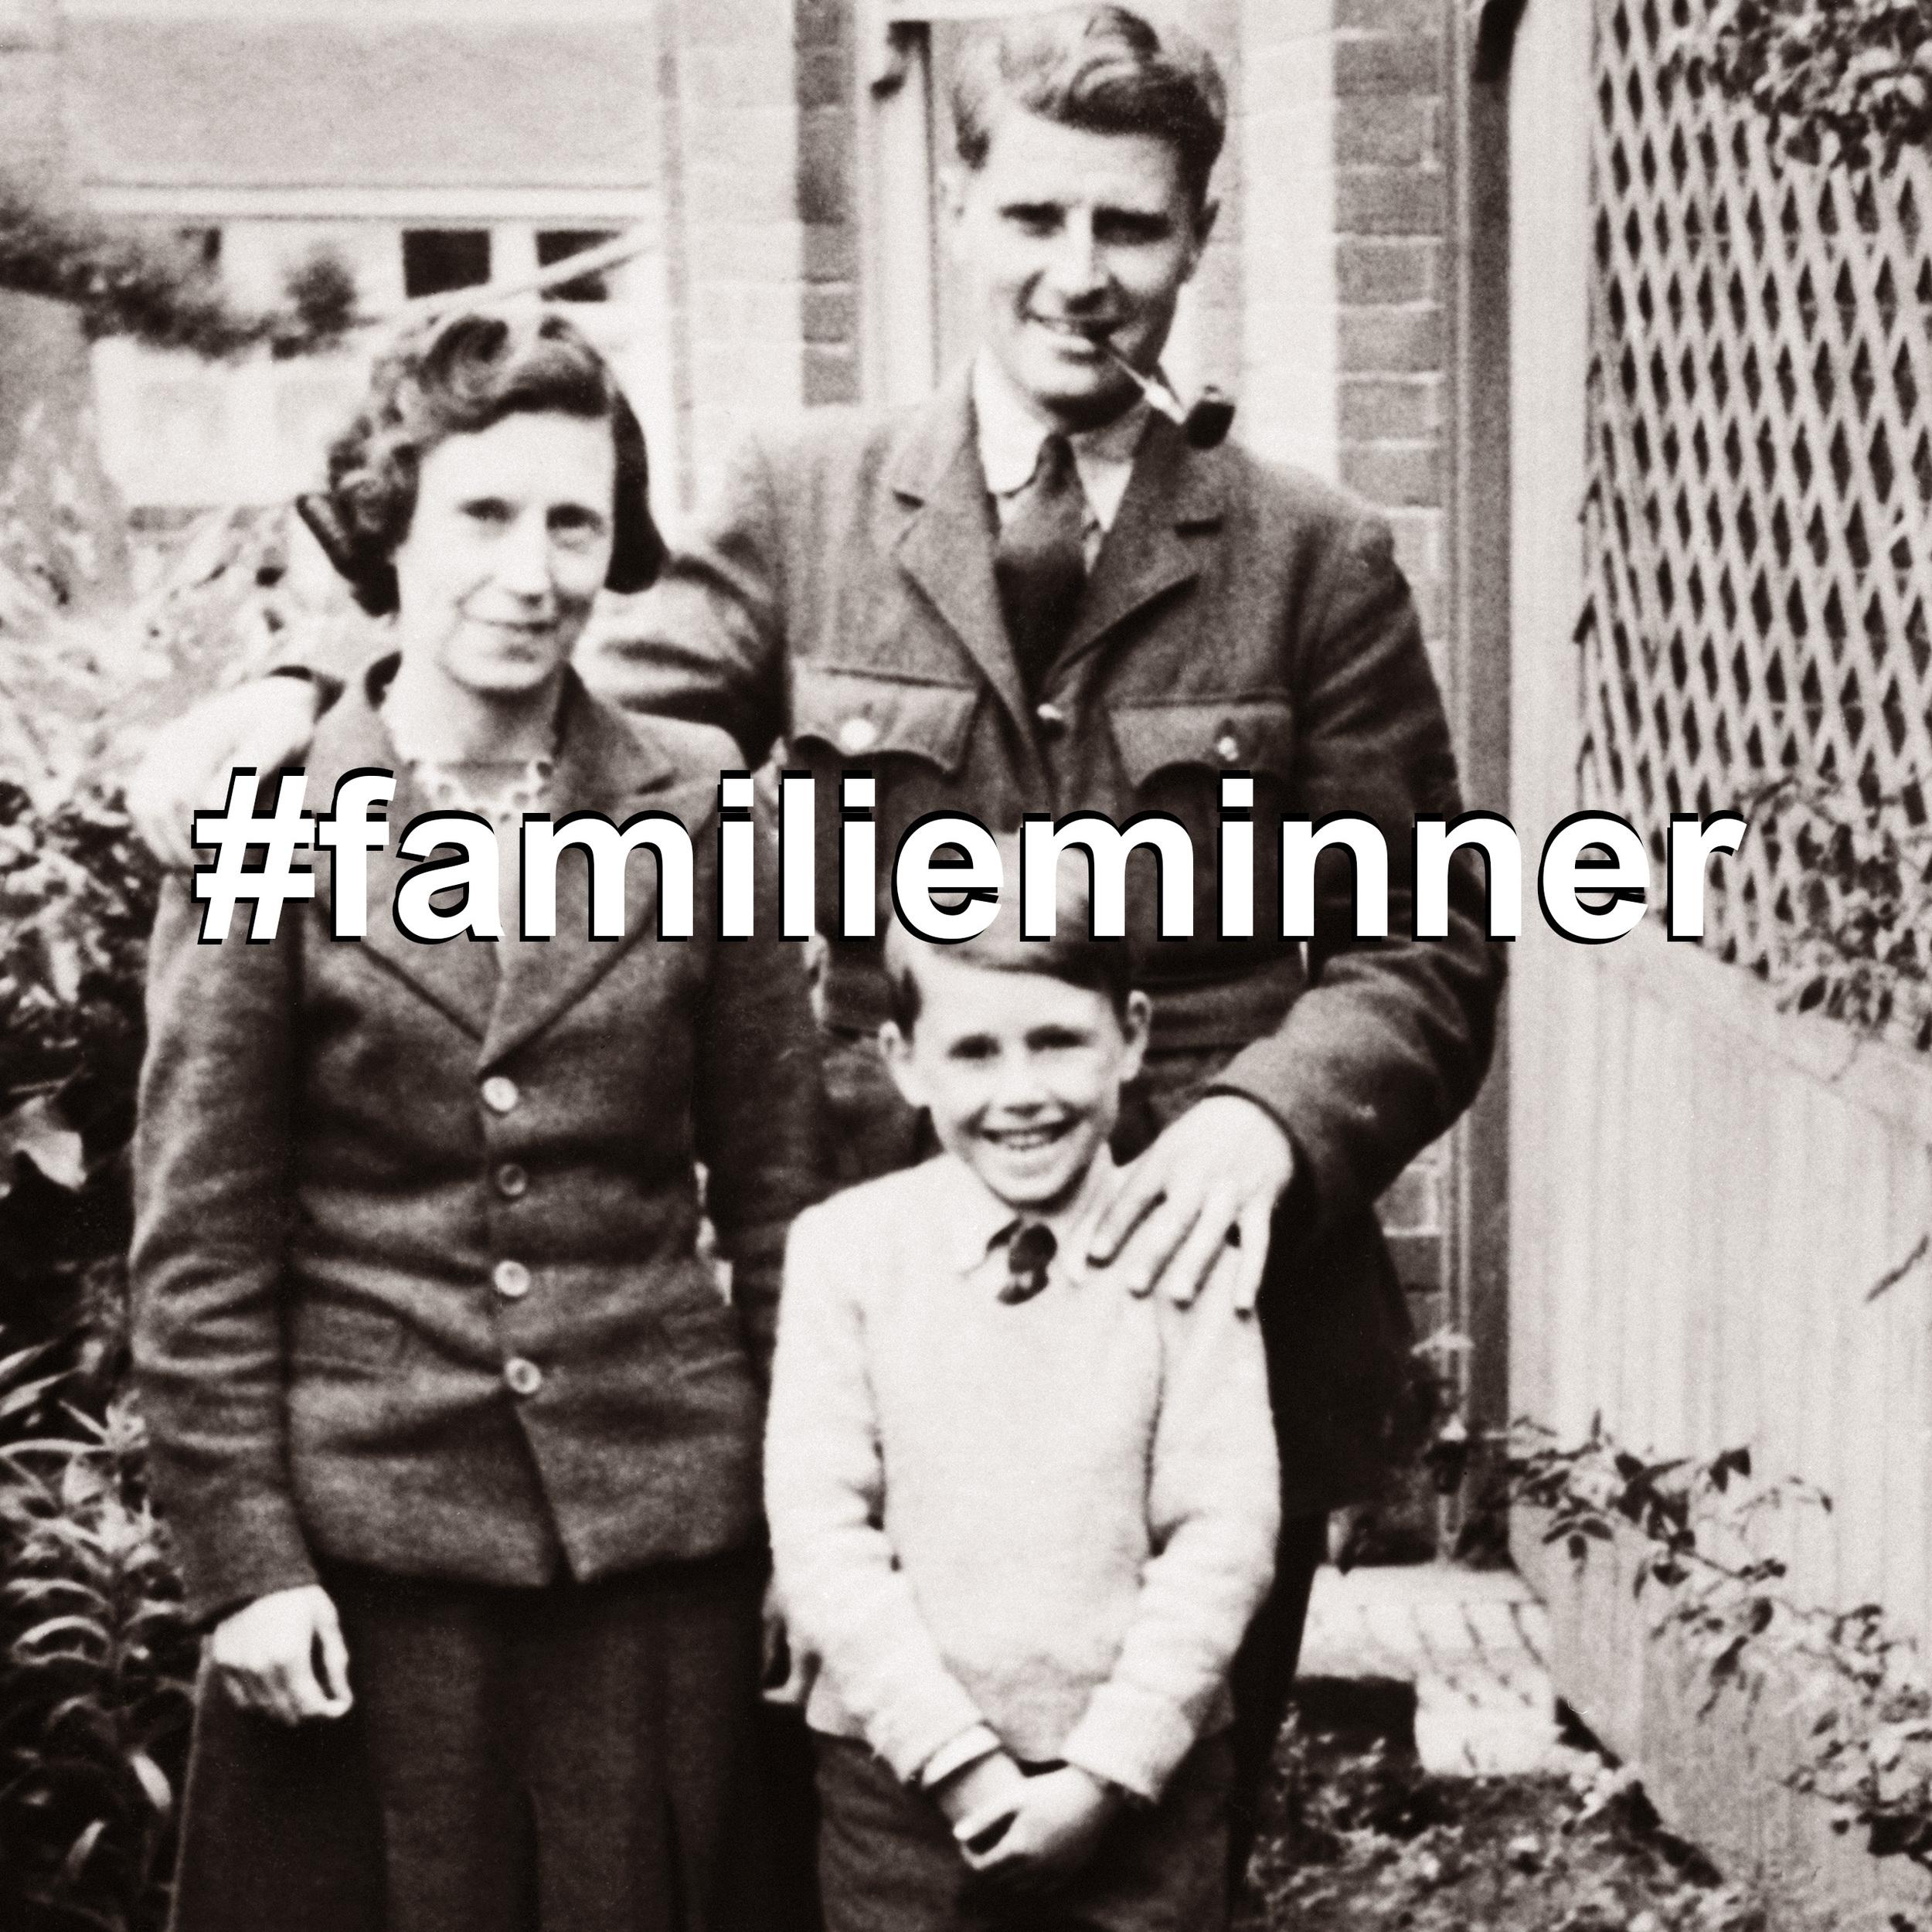 familieminner3.jpg